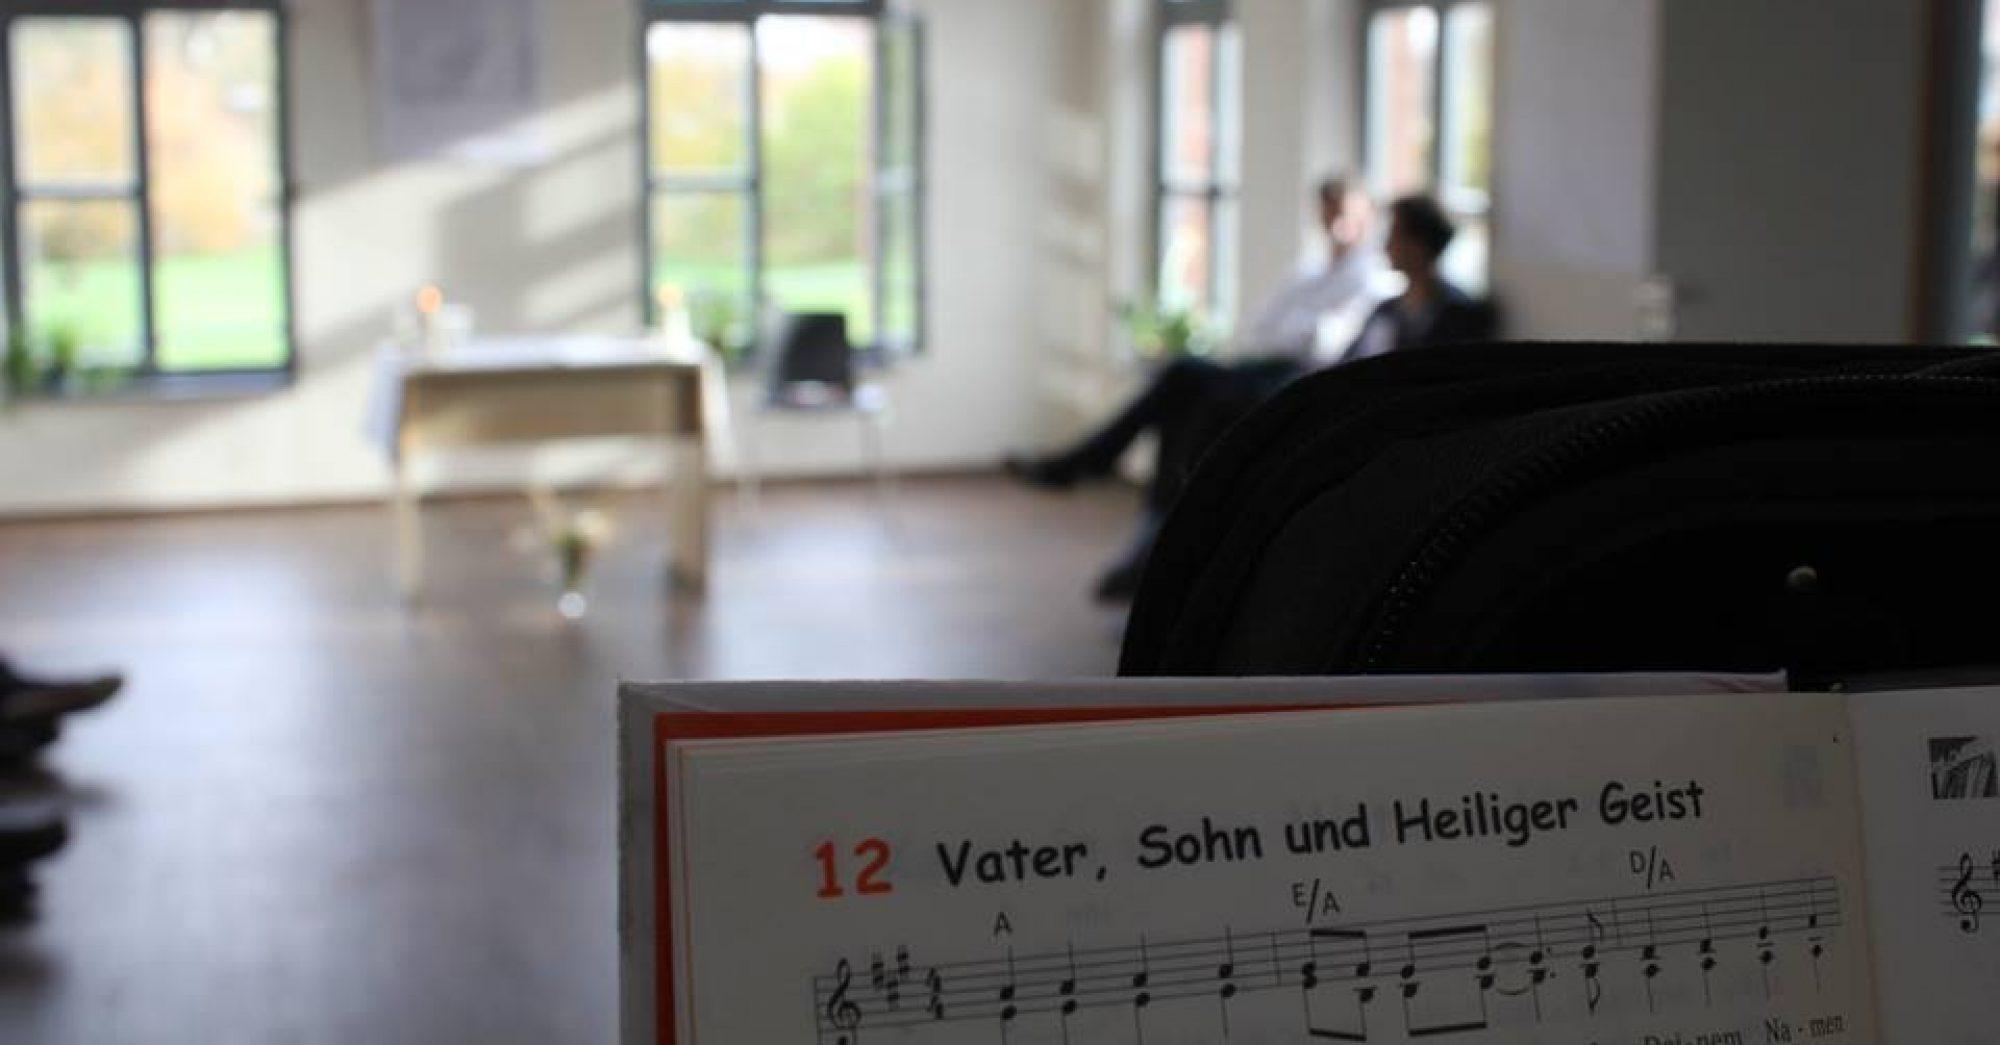 liturgiewissenschaft.de